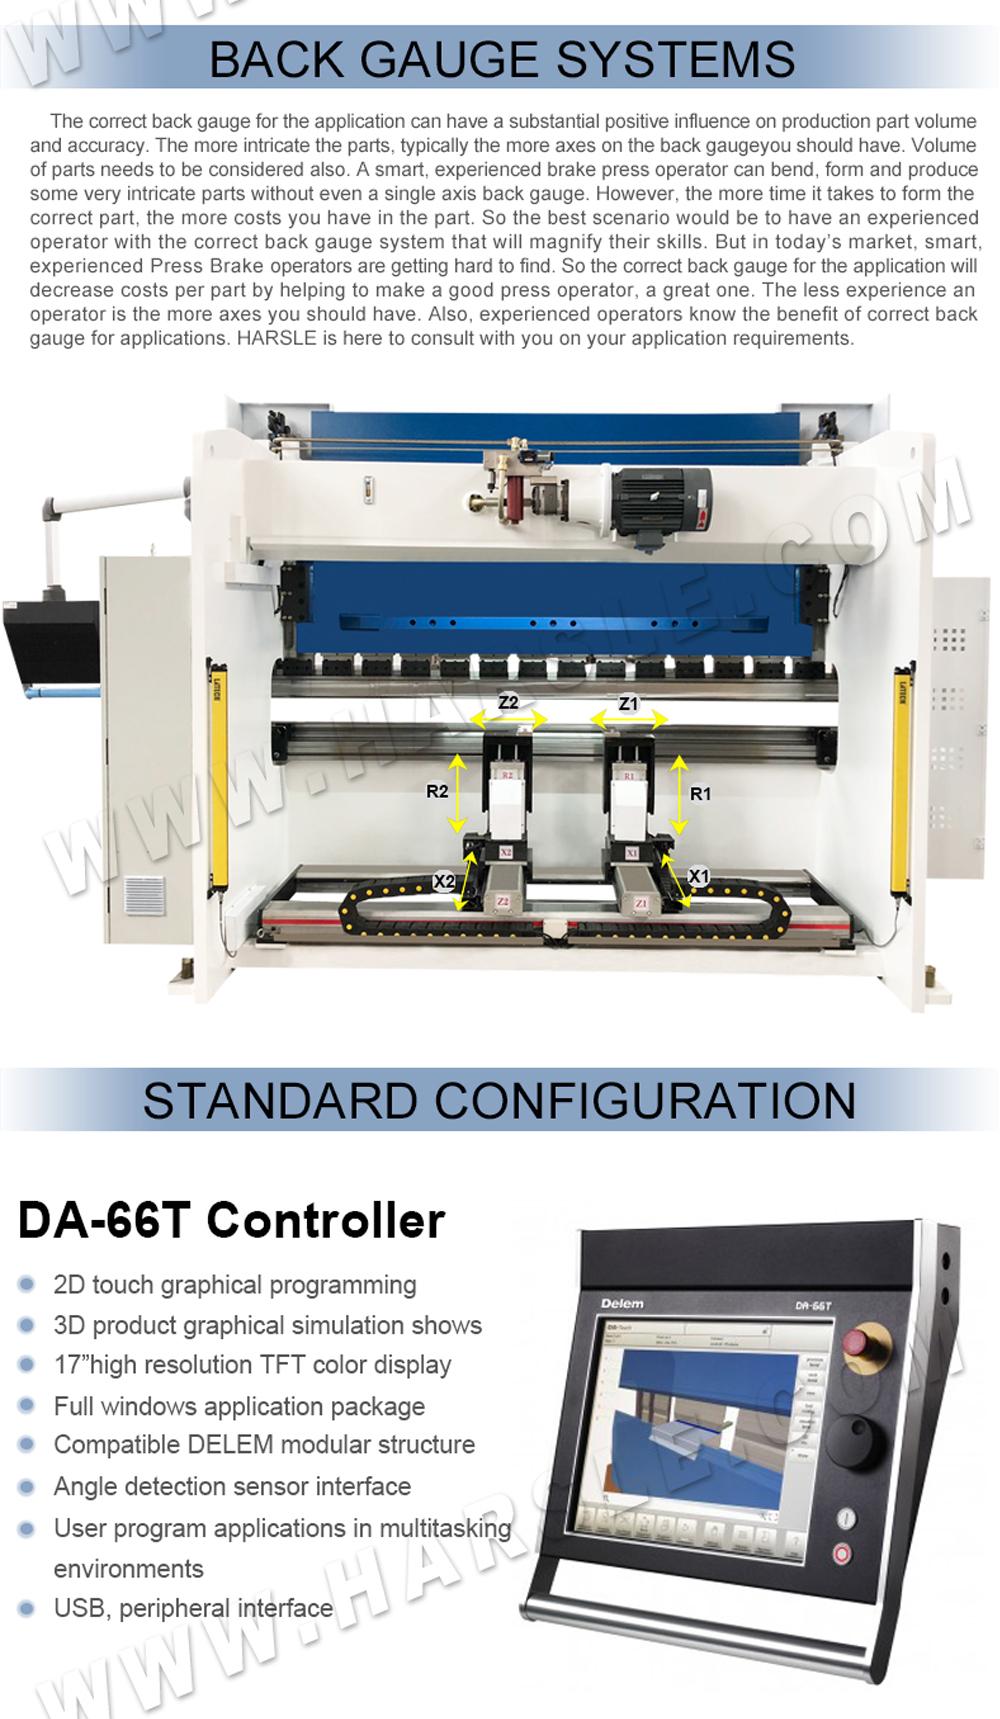 CNC press brake with DA-66T, WE67K-125T/3200 hydraulic press